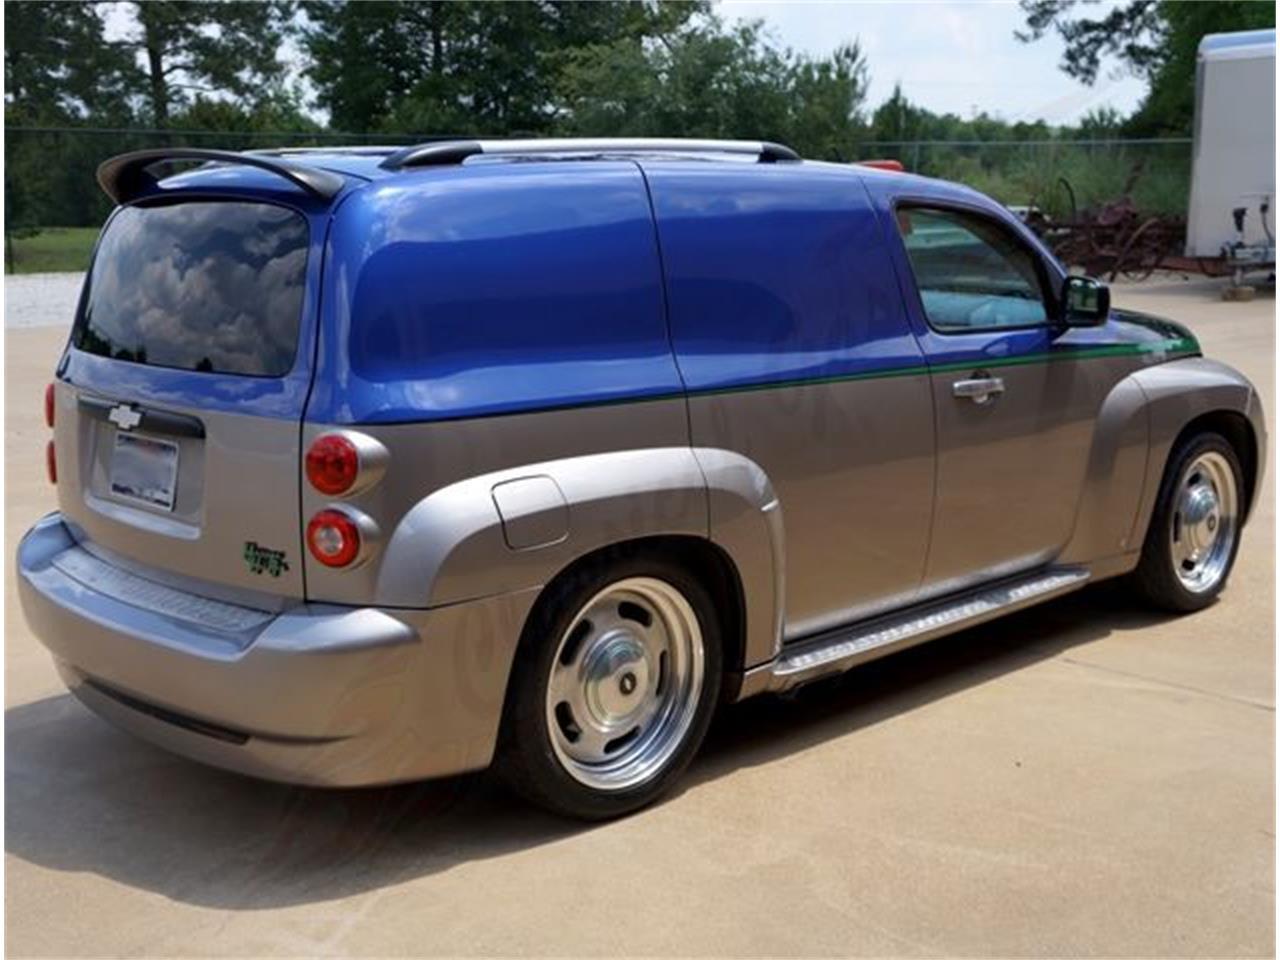 2007 Chevrolet HHR (CC-888266) for sale in Arlington, Texas